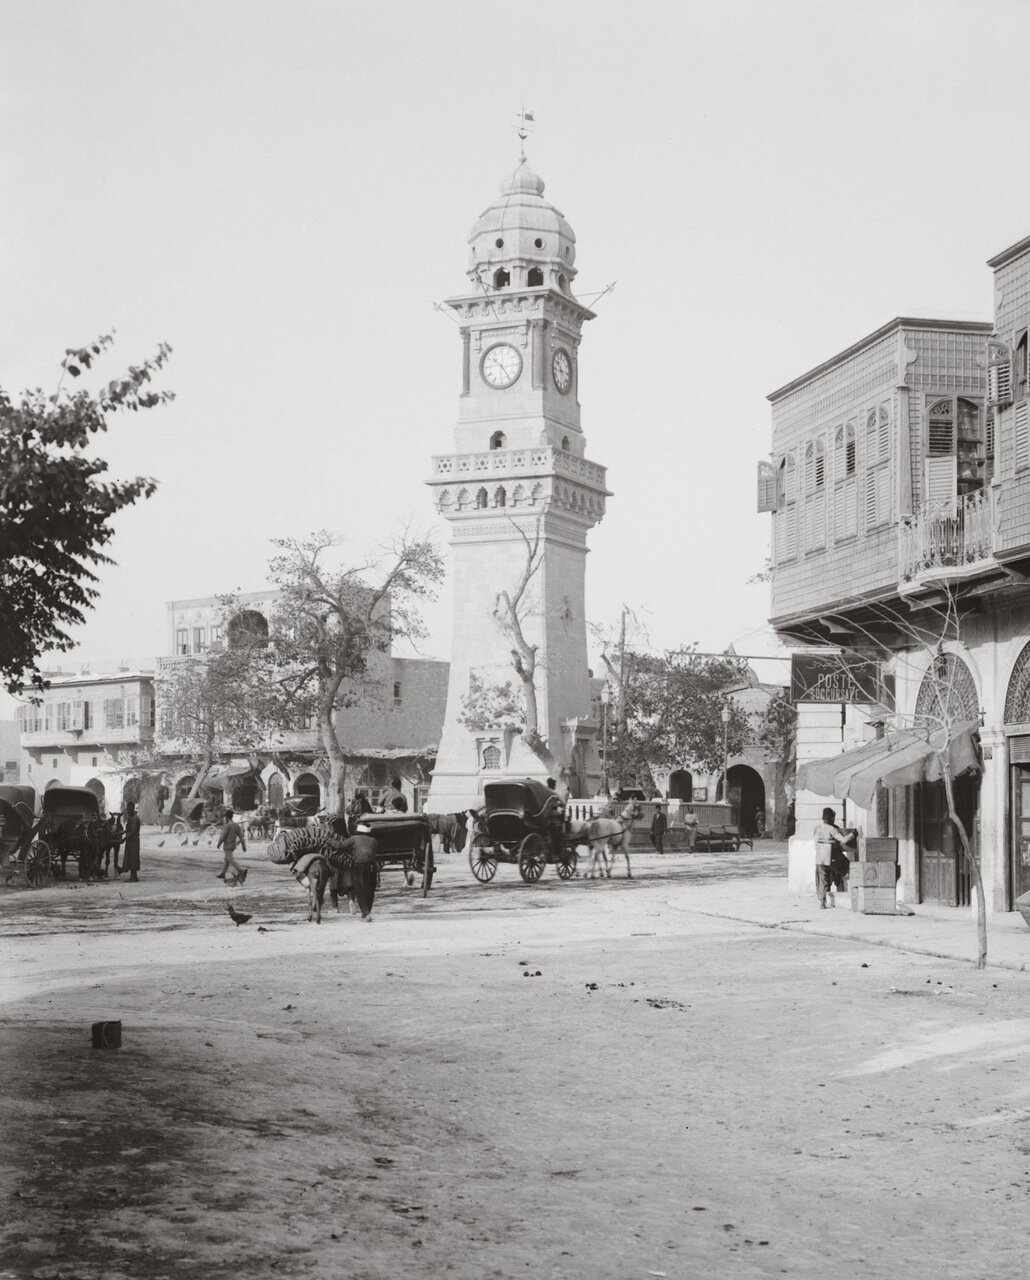 Площадь в Алеппо, Сирия. 1900-1920 гг.